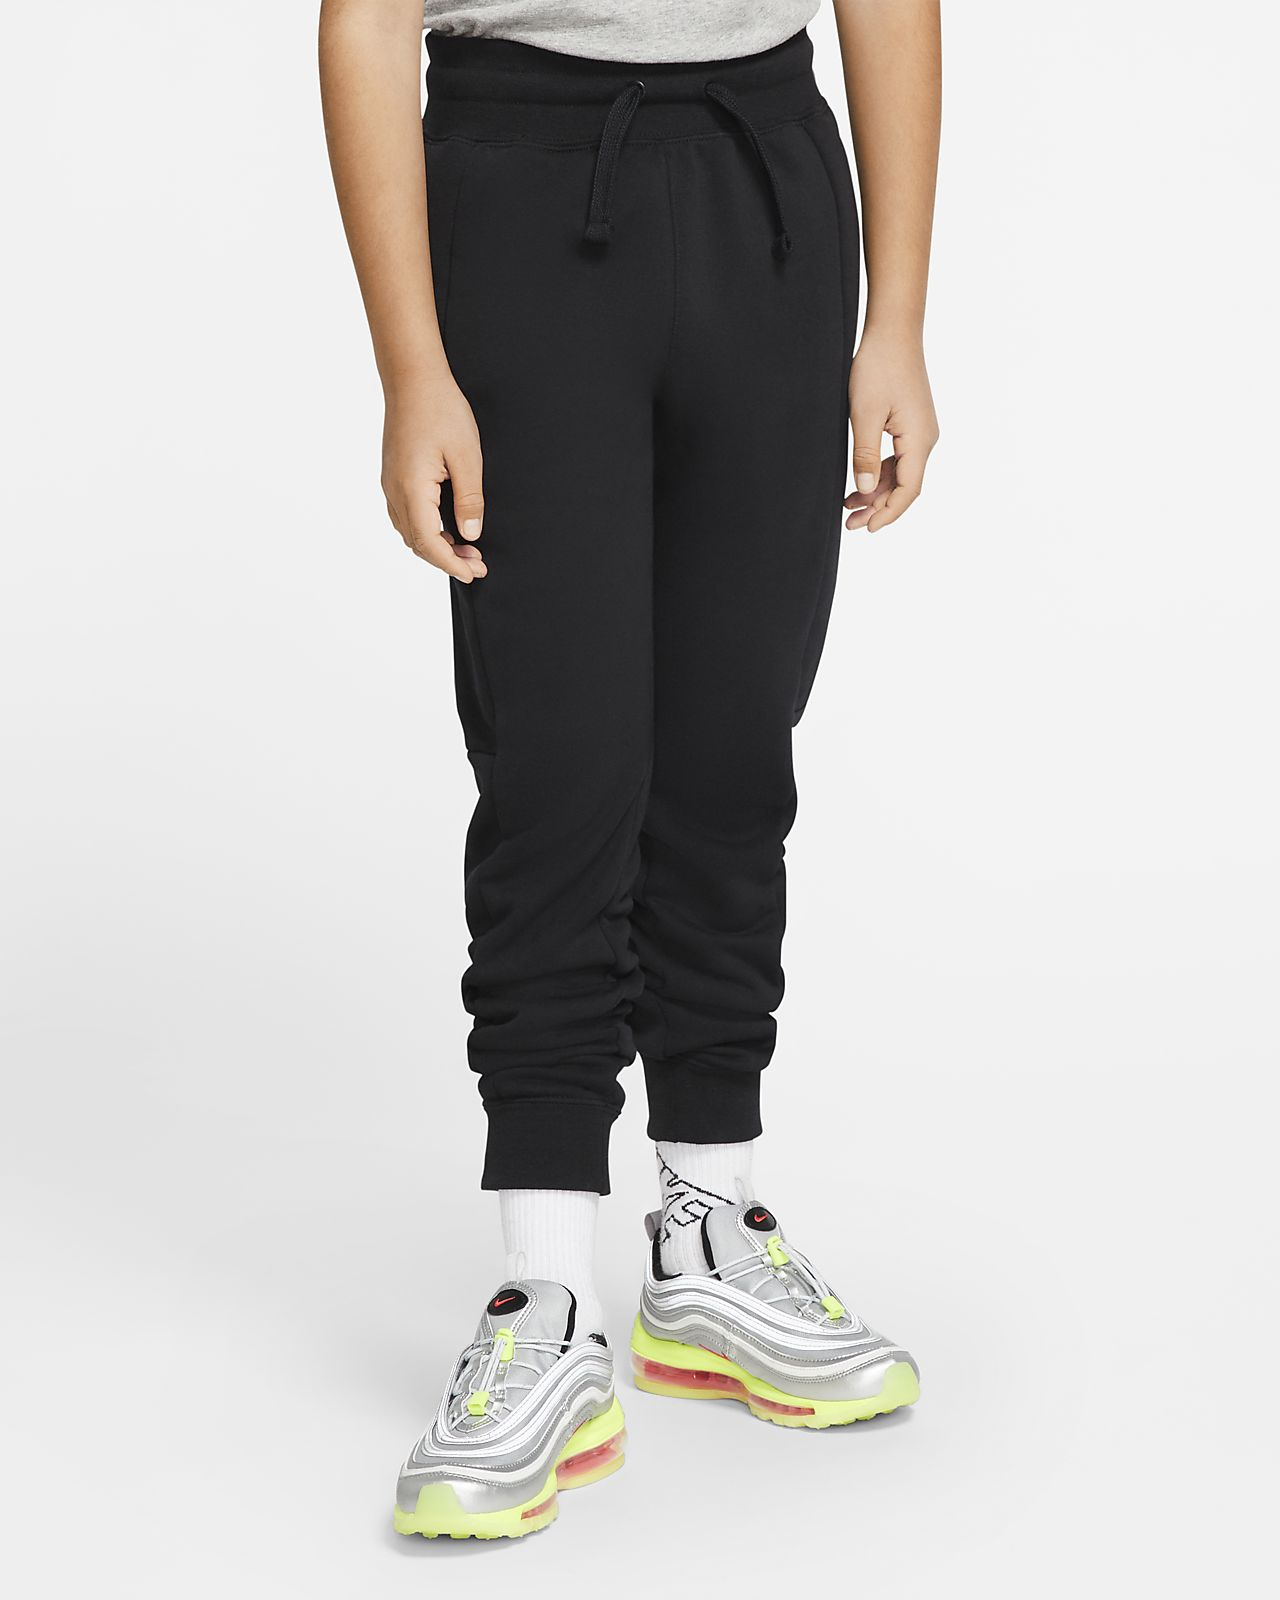 Byxor Nike Air för ungdom (killar)